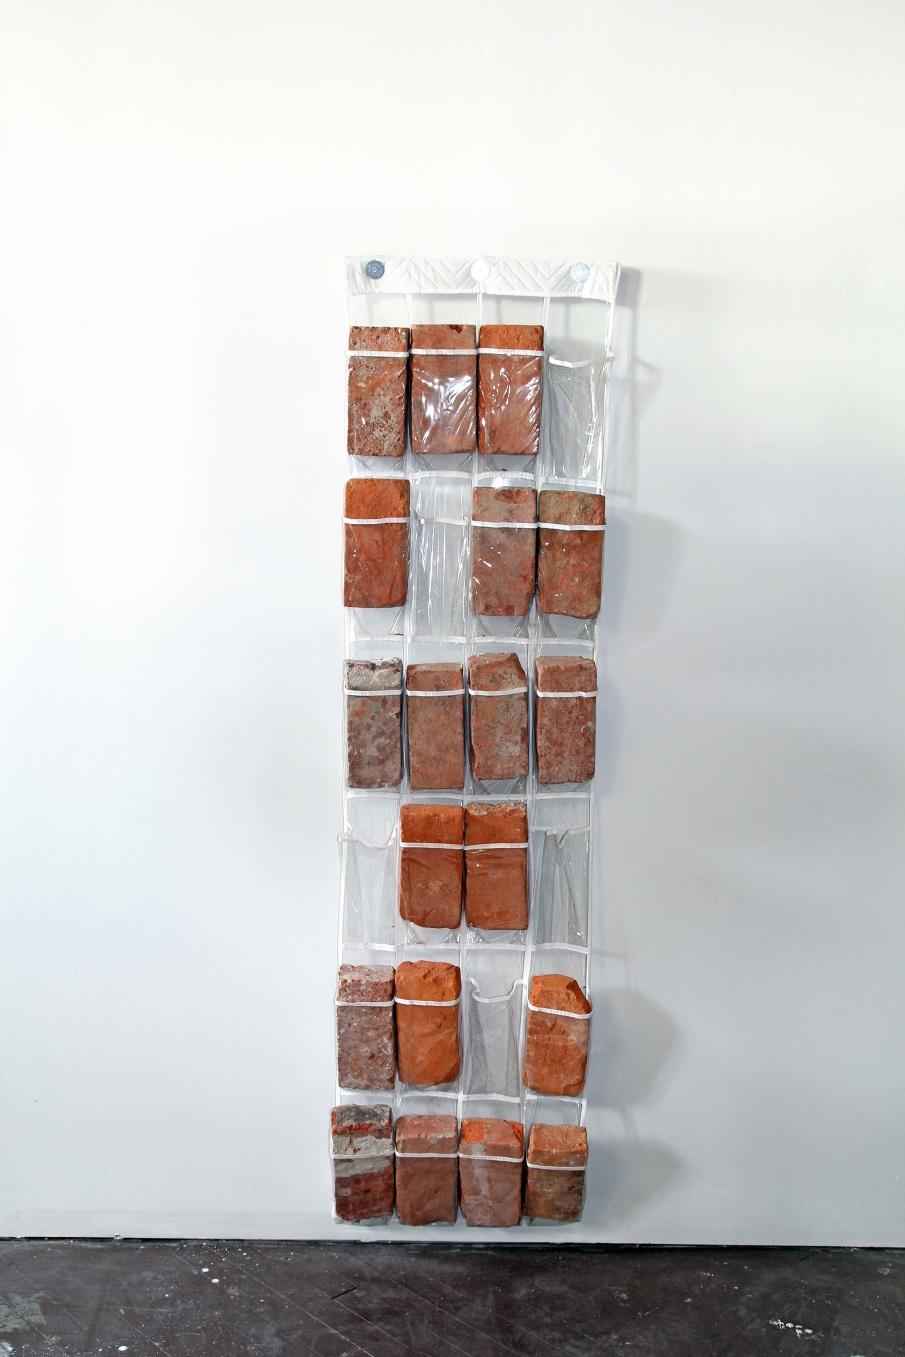 Kasey Toomey   Brick Rack , 2014/2017  Found Bricks, Plastic Shoe Rack, Wood  58x4x16 in.